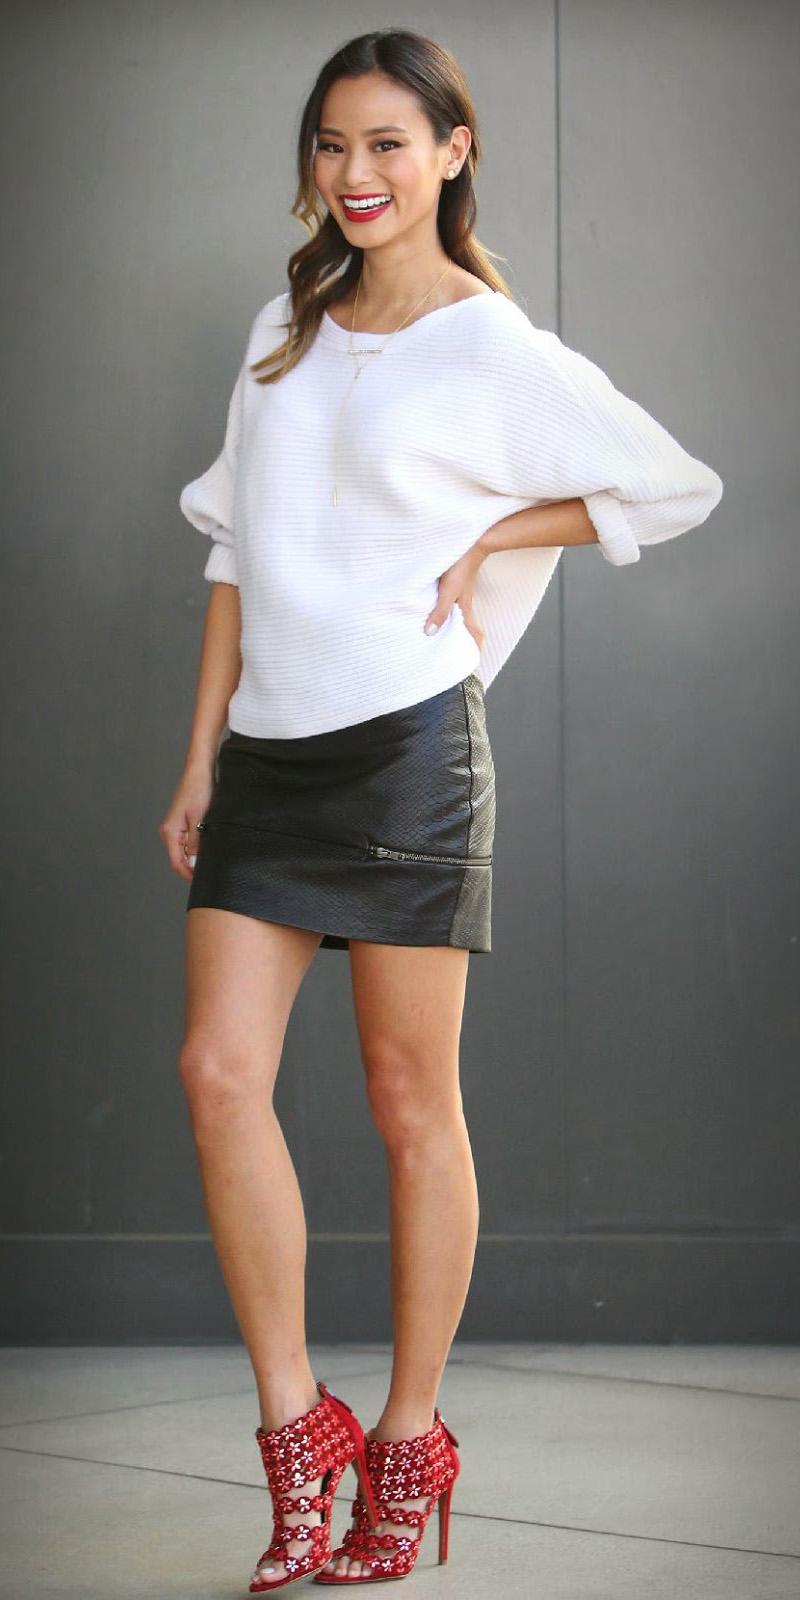 black-mini-skirt-white-sweater-jamiechung-wear-style-fashion-fall-winter-black-shoe-sandalh-brun-dinner.jpg